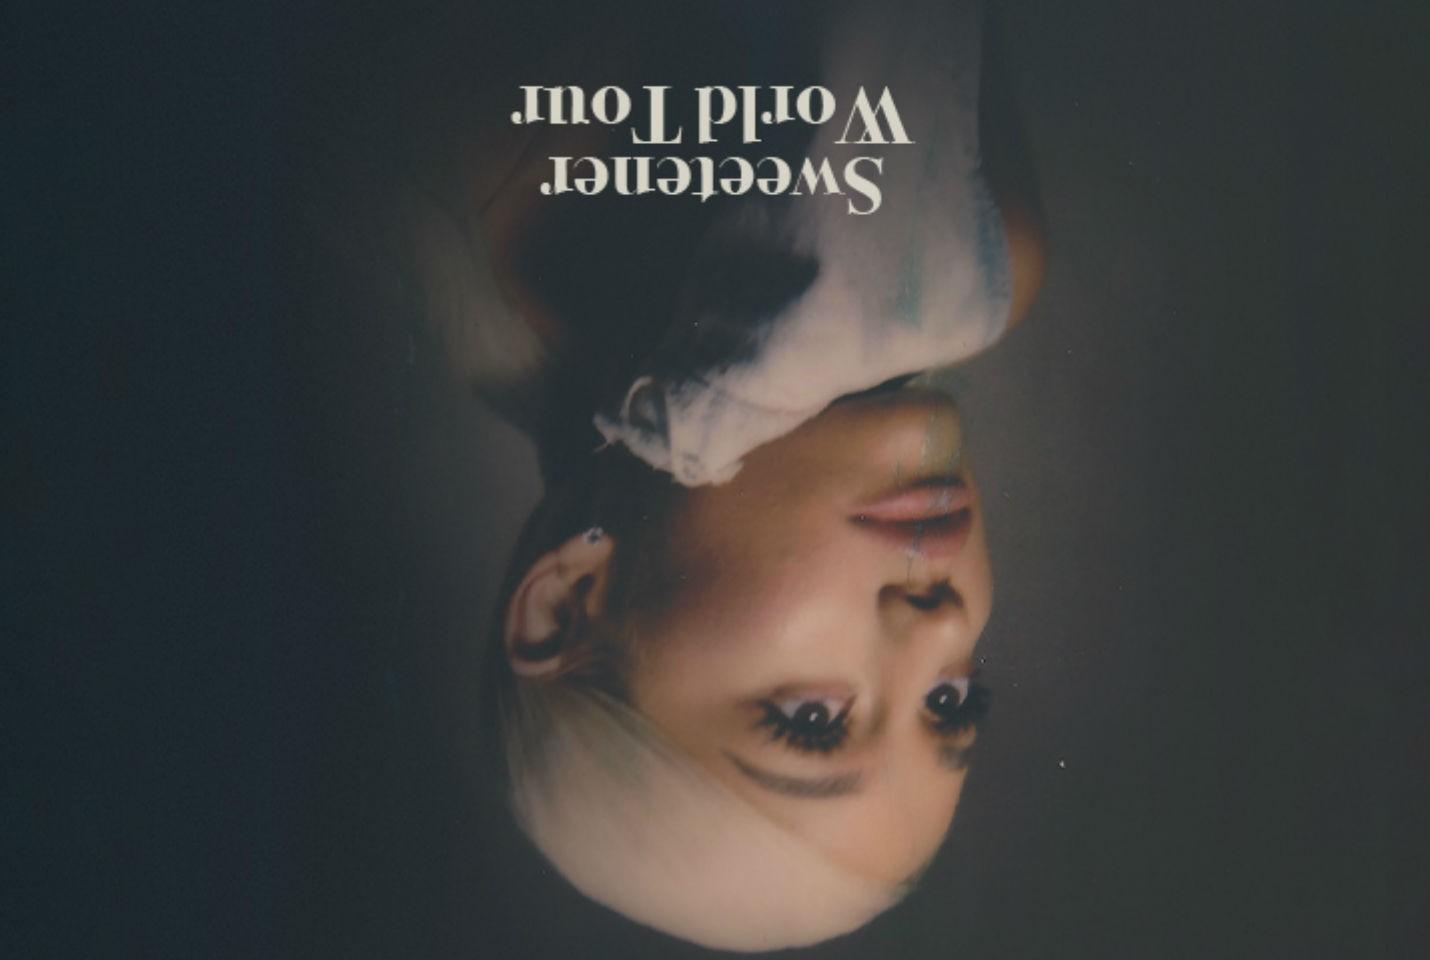 Ariana Grande - Important Info